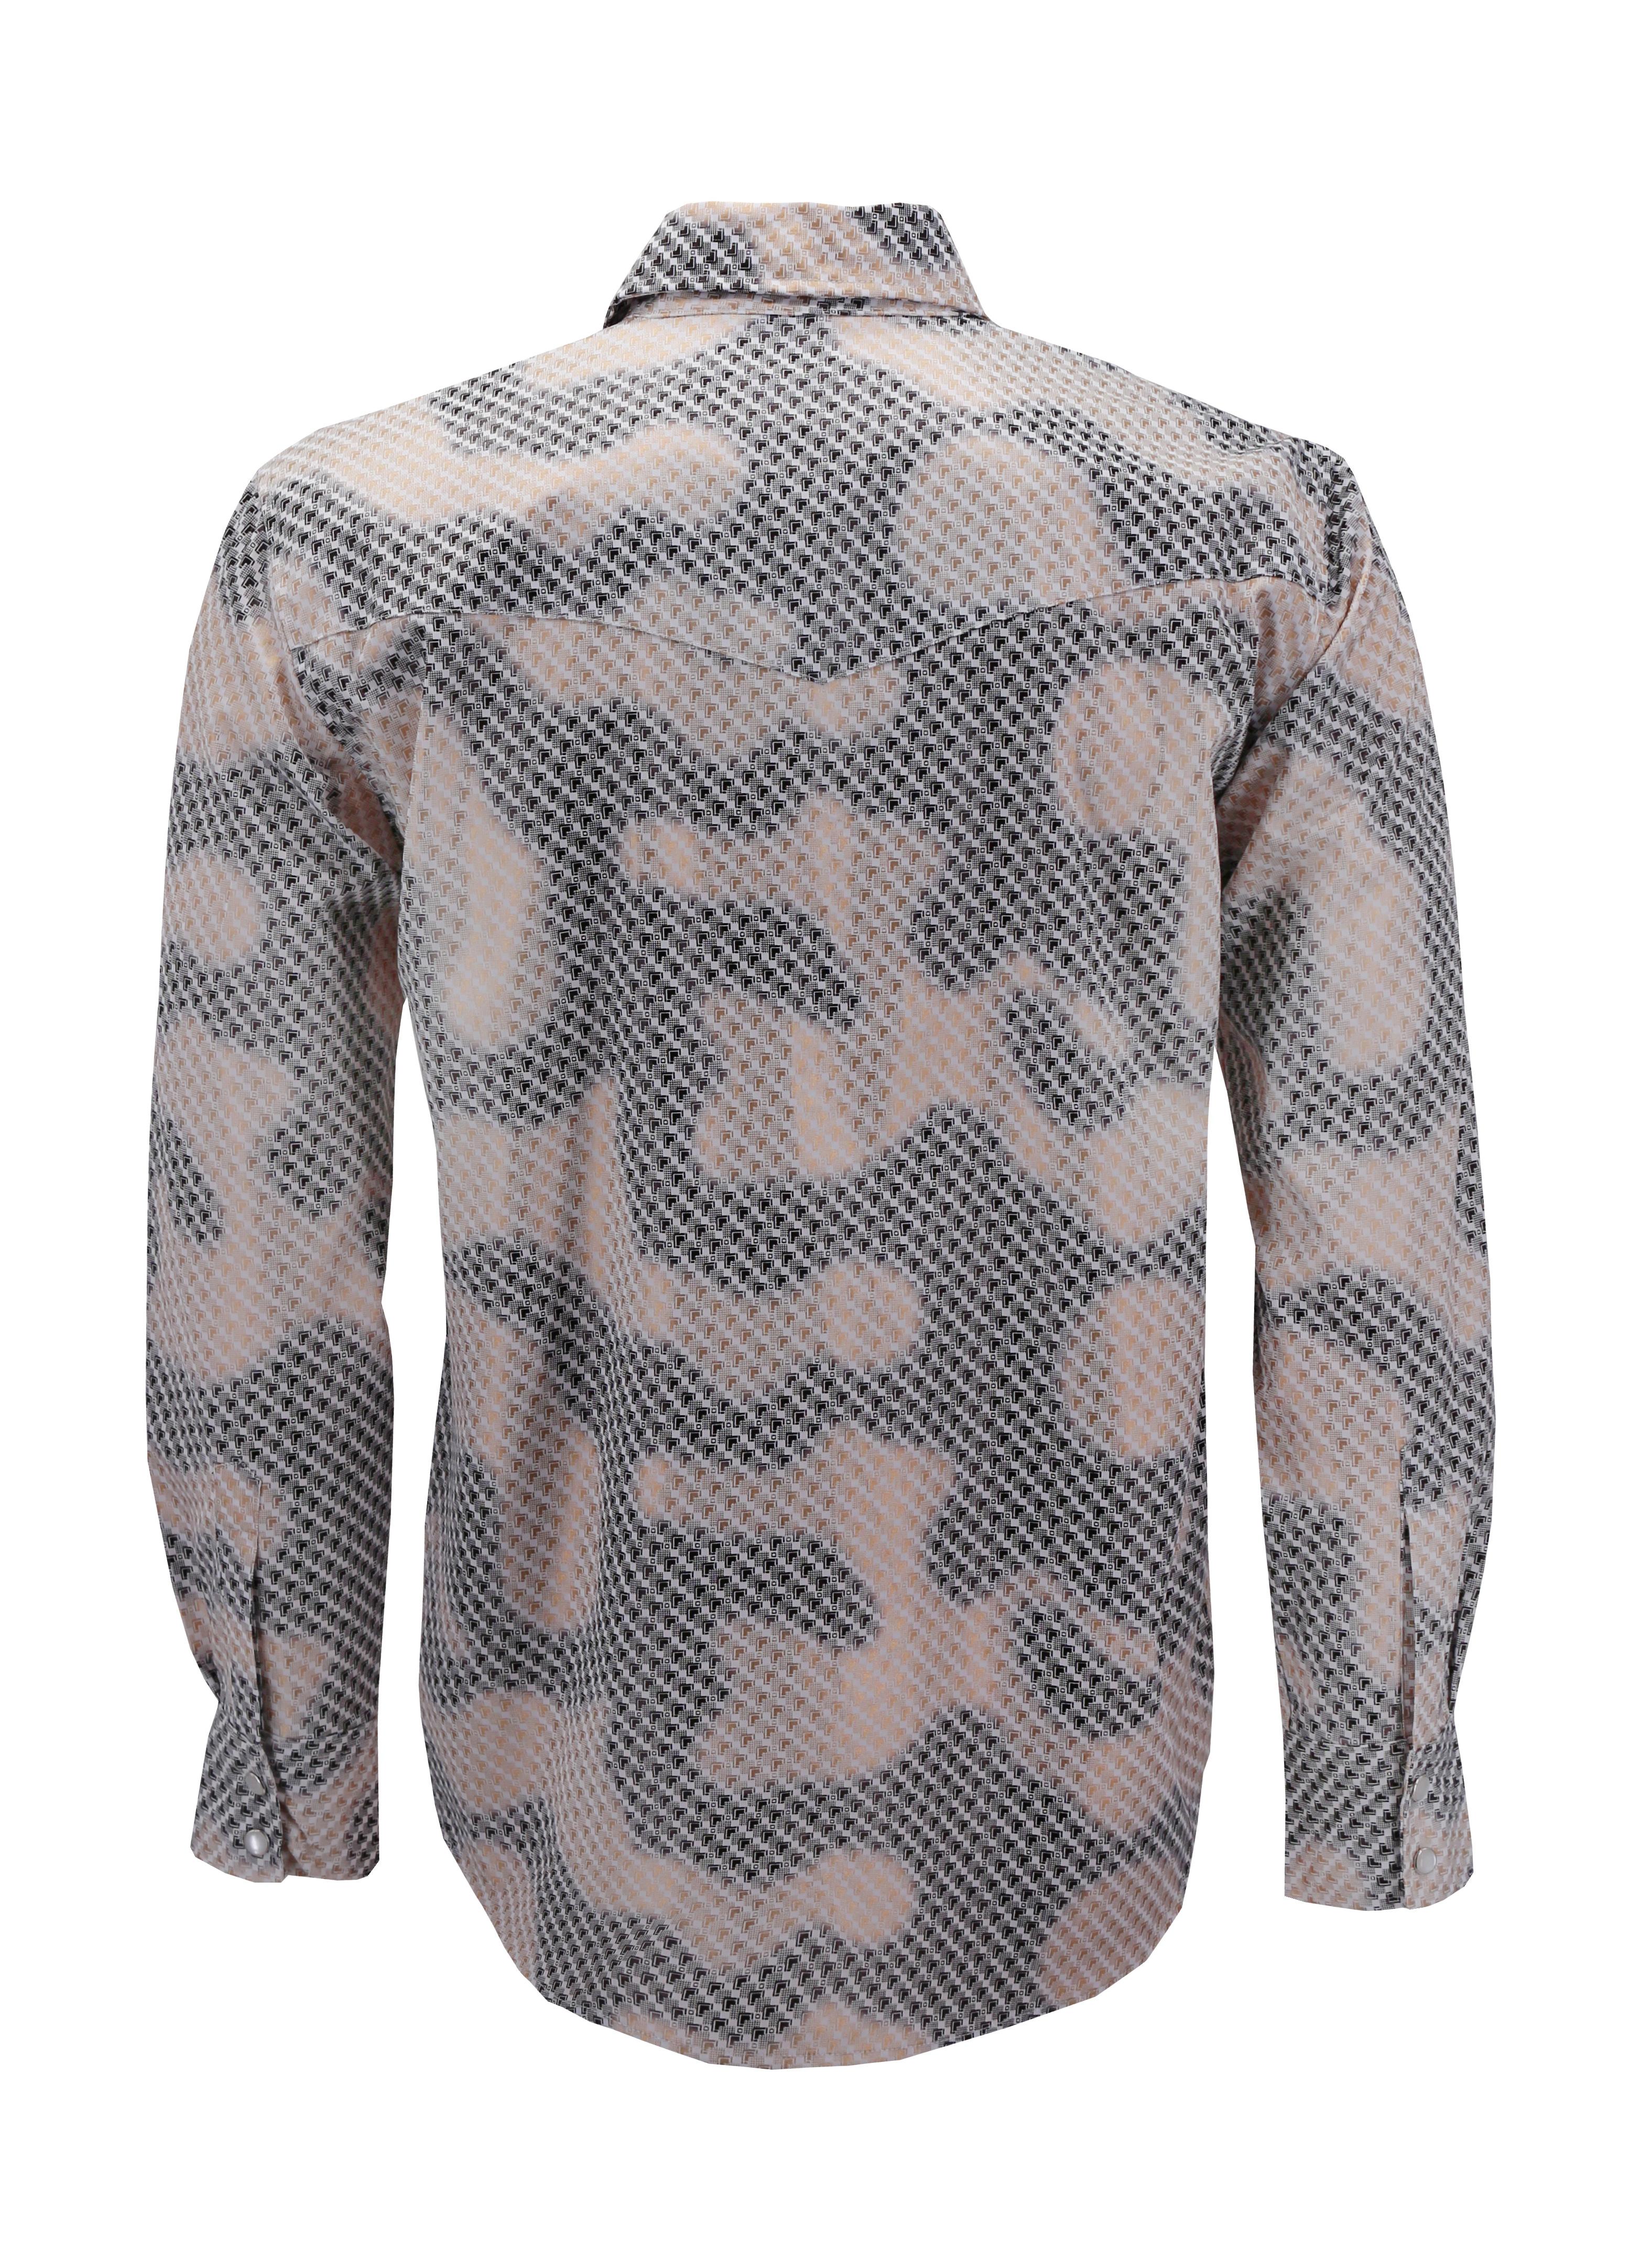 Men-039-s-Western-Long-Sleeve-Stylish-Metallic-Modern-Cowboy-Rodeo-Dress-Shirt thumbnail 22